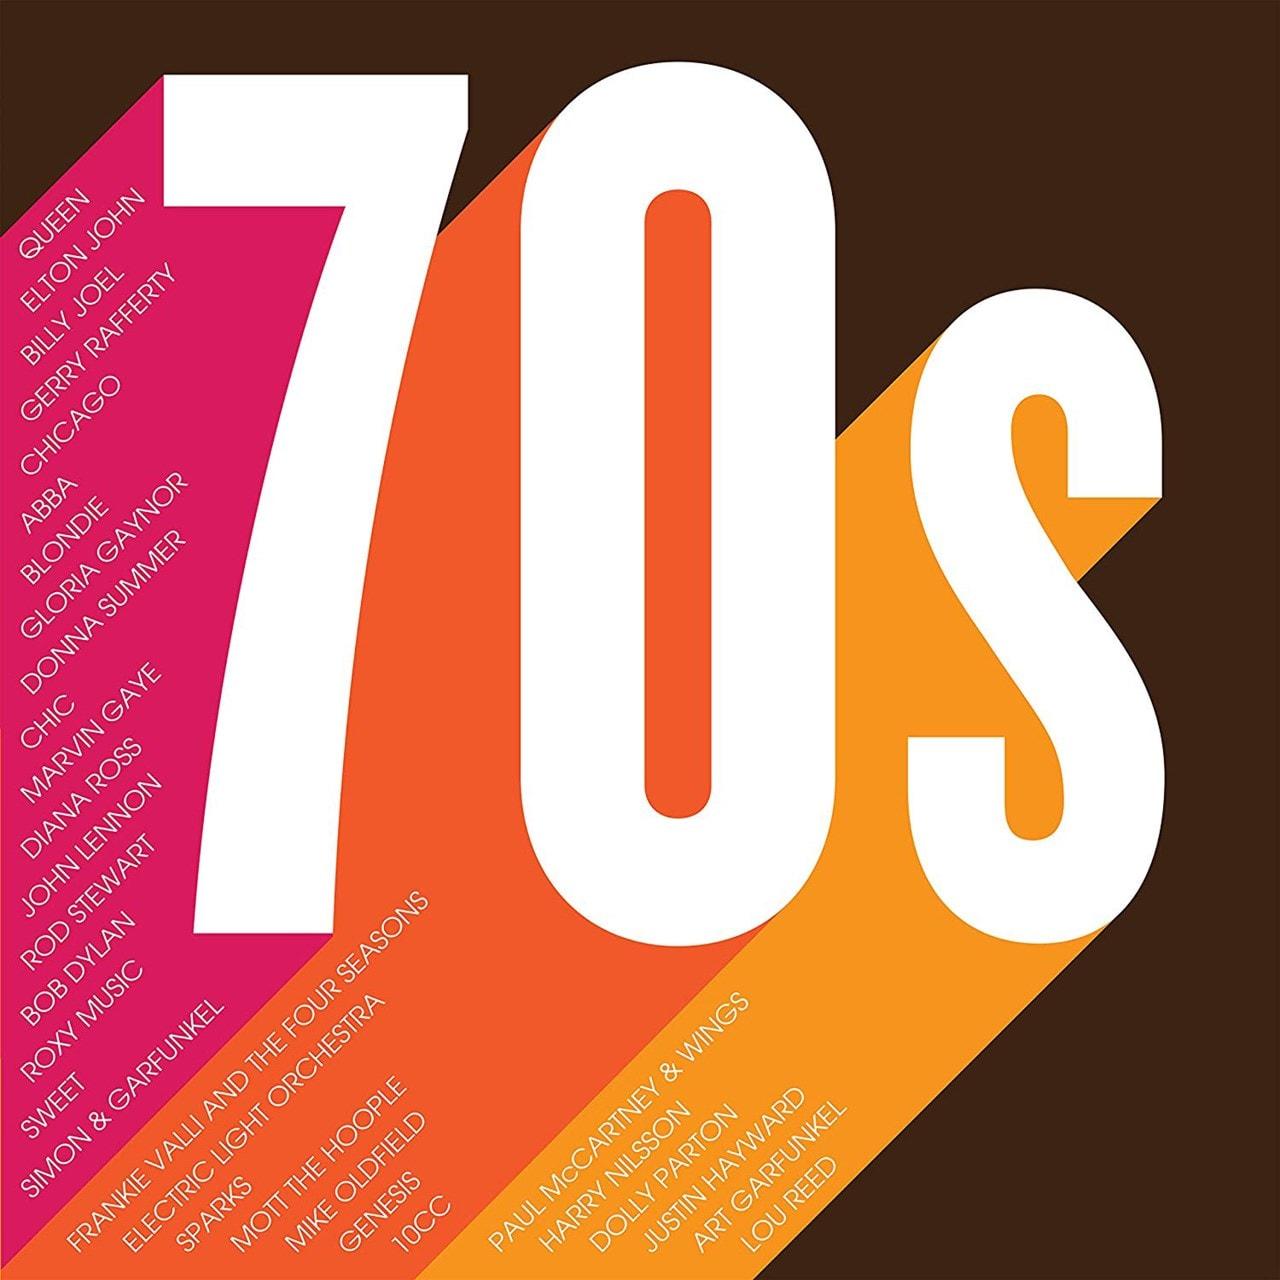 70s - 1